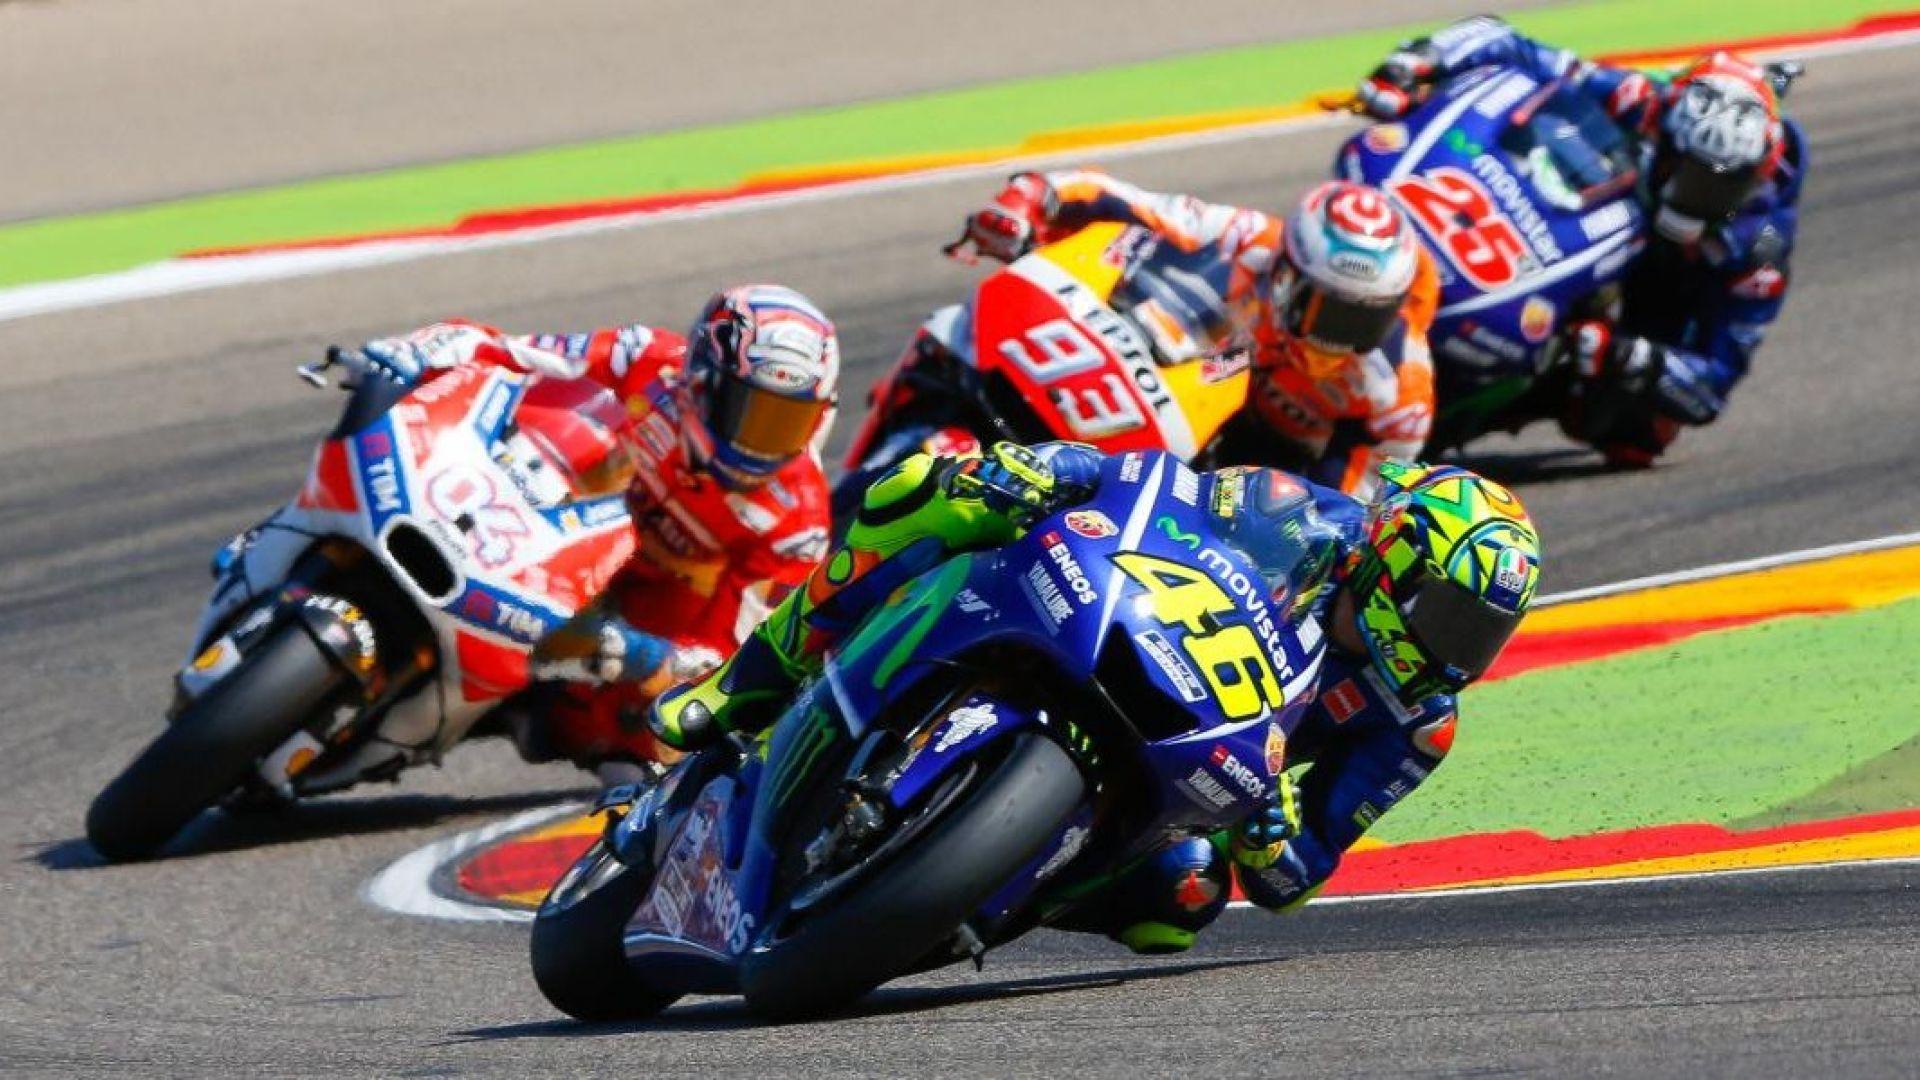 MotoGP 2018: la entry list dei piloti MotoGP che correranno nel 2018 - MotorBox